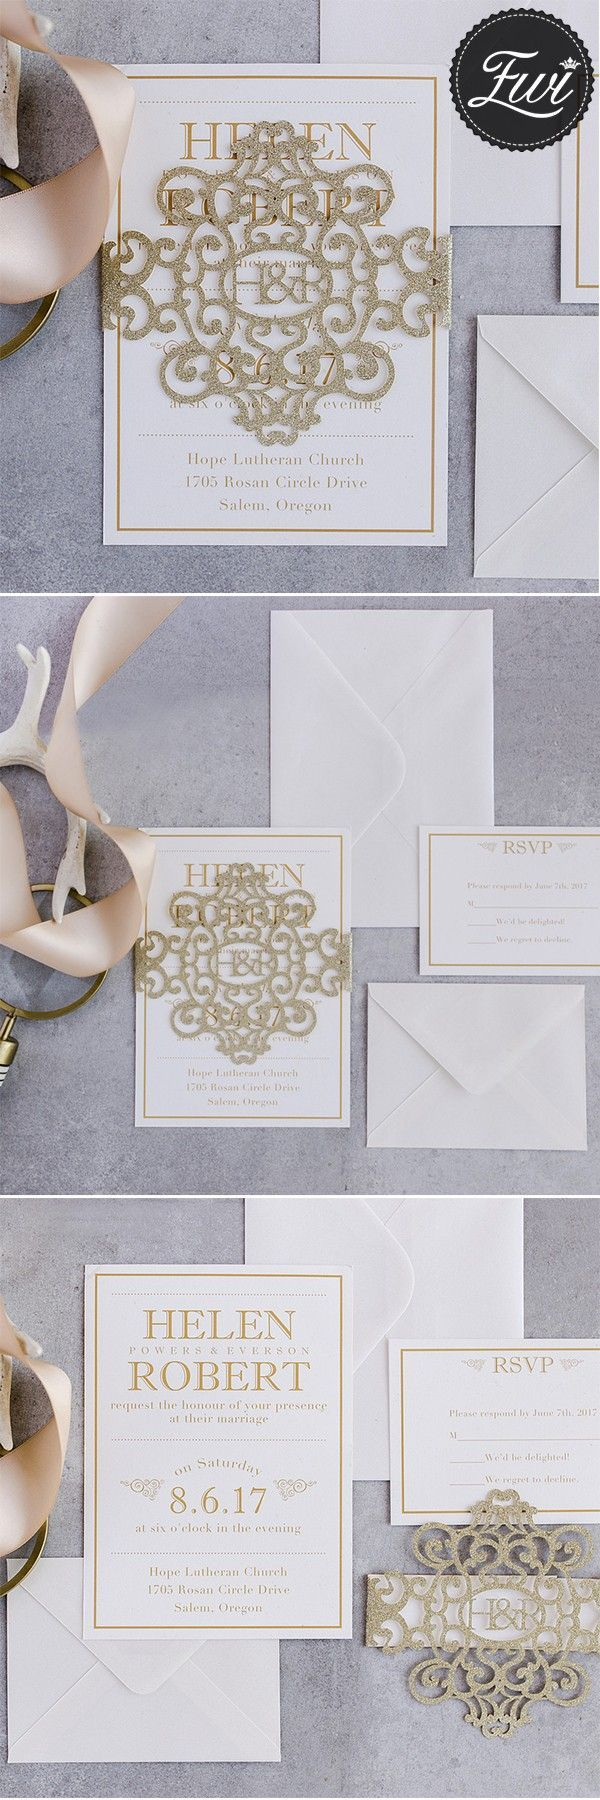 casual evening wedding invitation wording%0A modern gold glitter monogram laser cut belly band wedding invitations  EWBLG     weddinginvitations  elegantweddinginvites